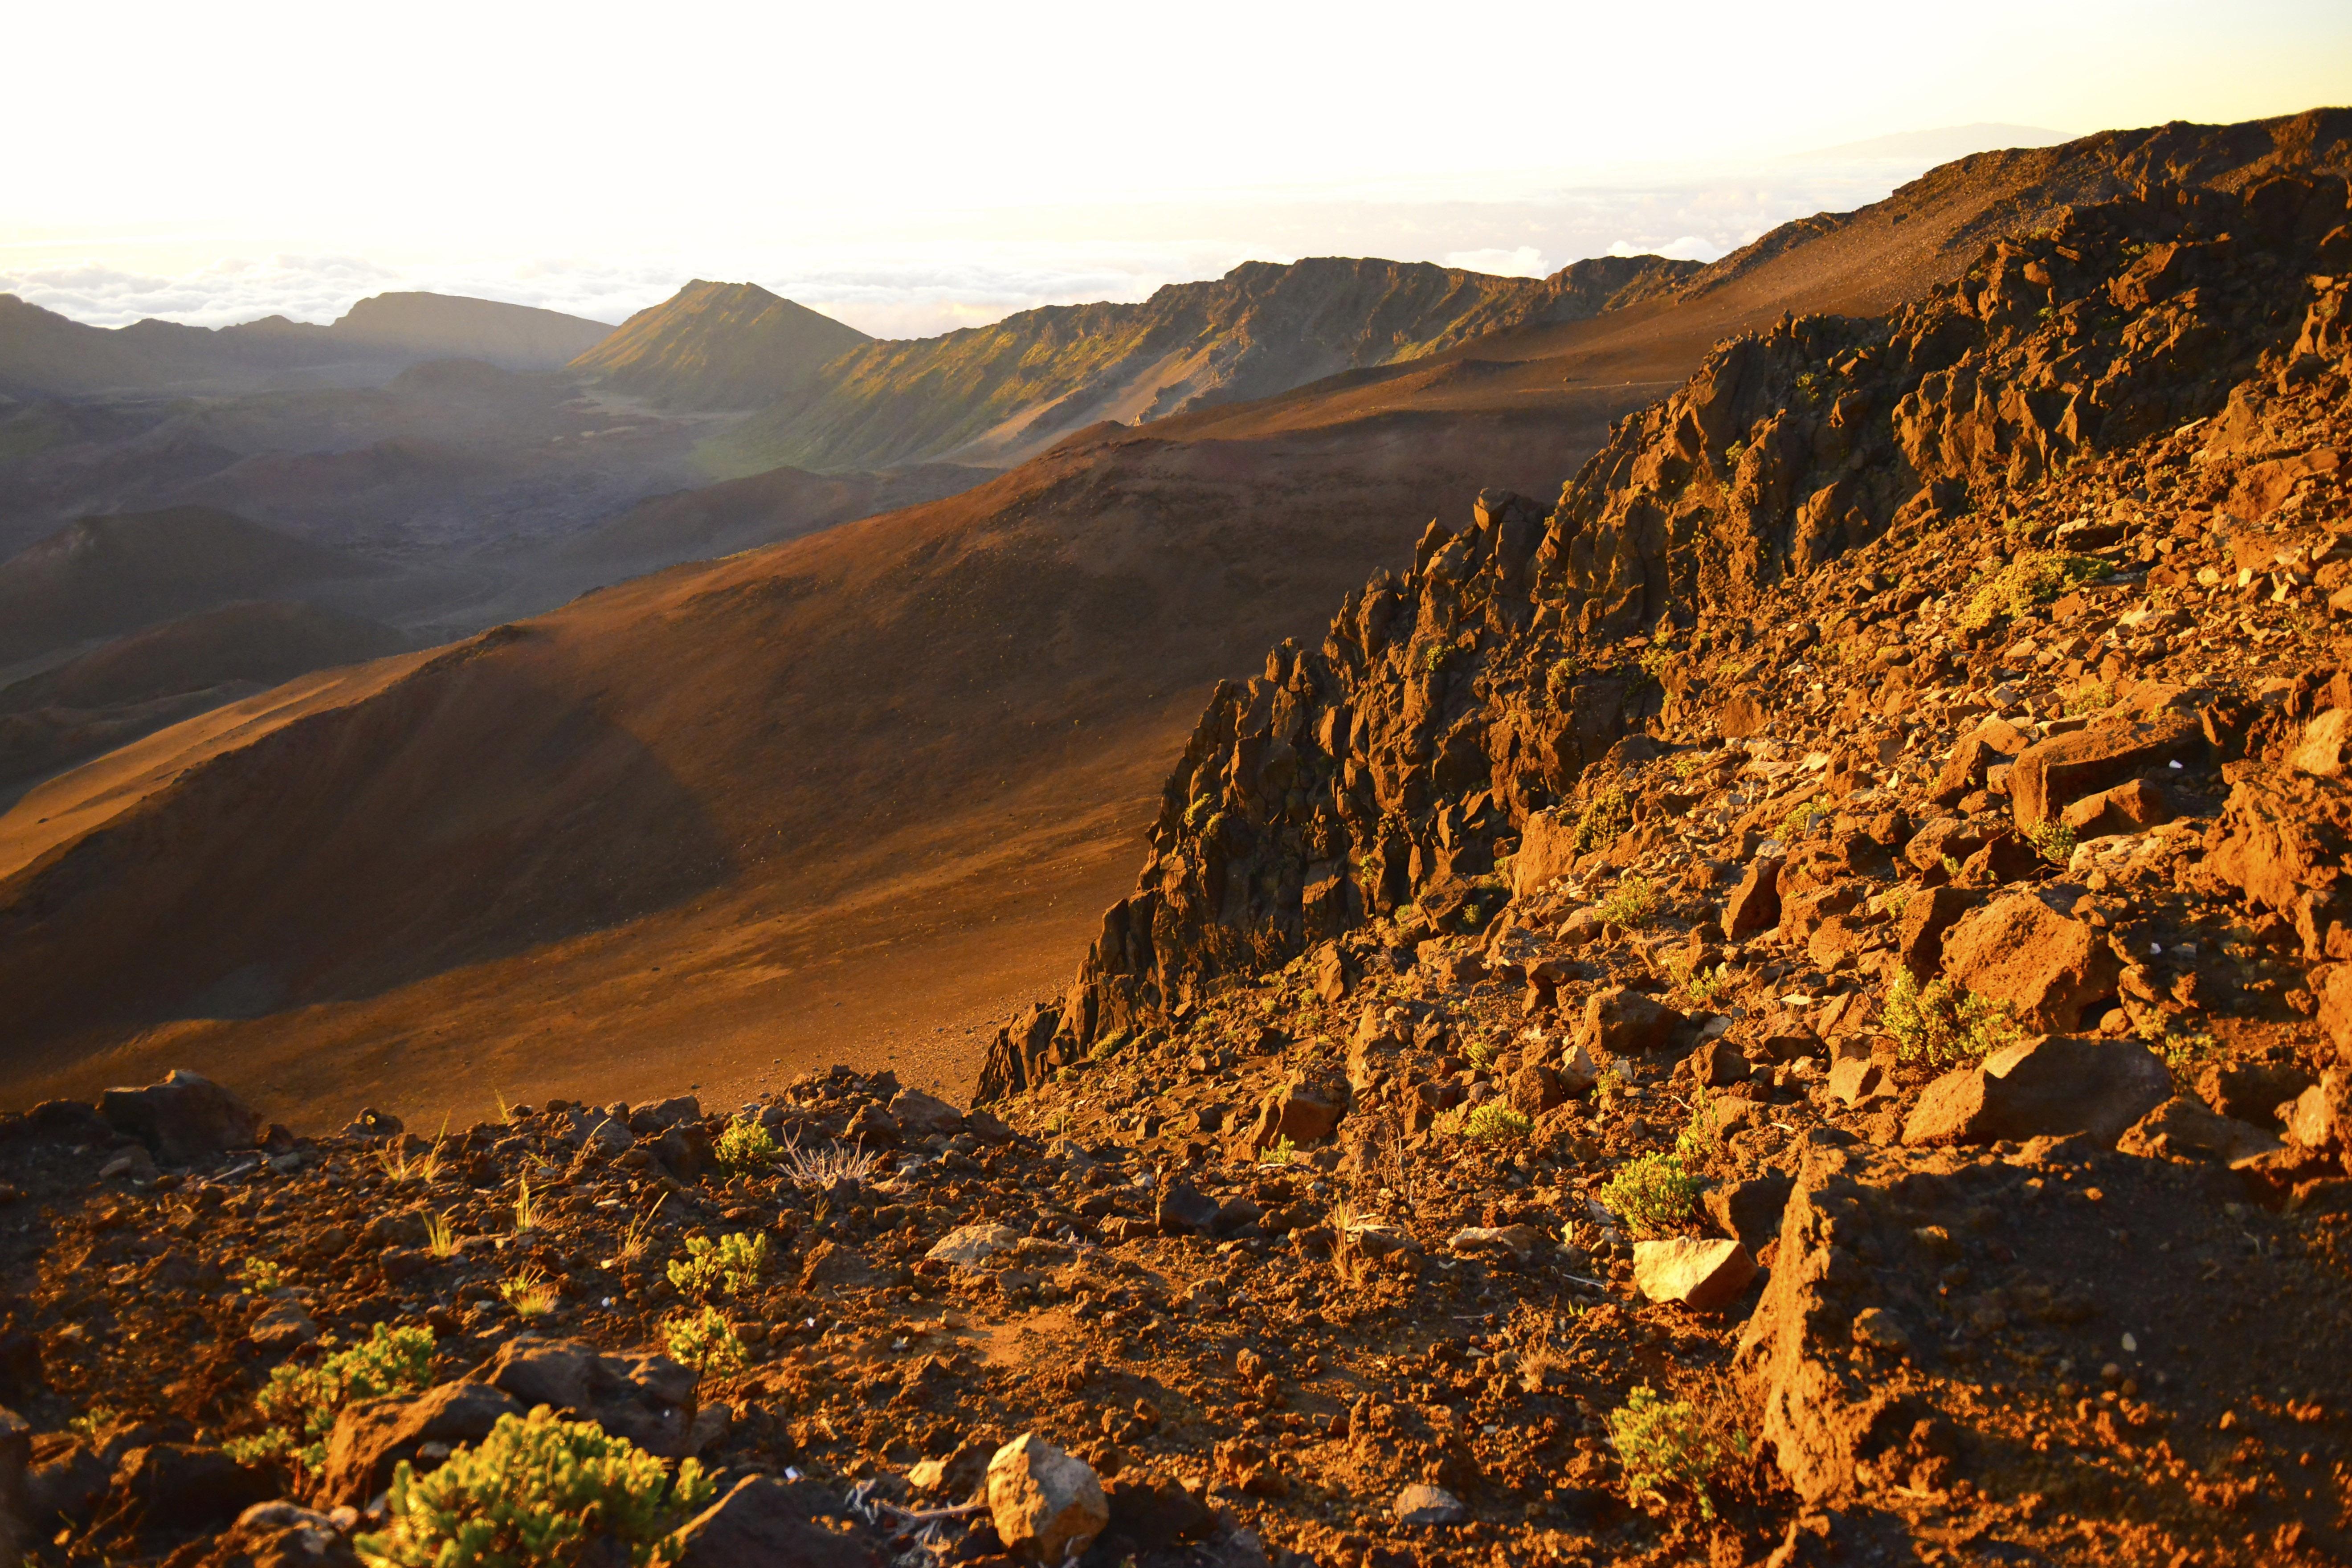 Rocky landscape at Haleakala National Park, Hawaii image - Free ...